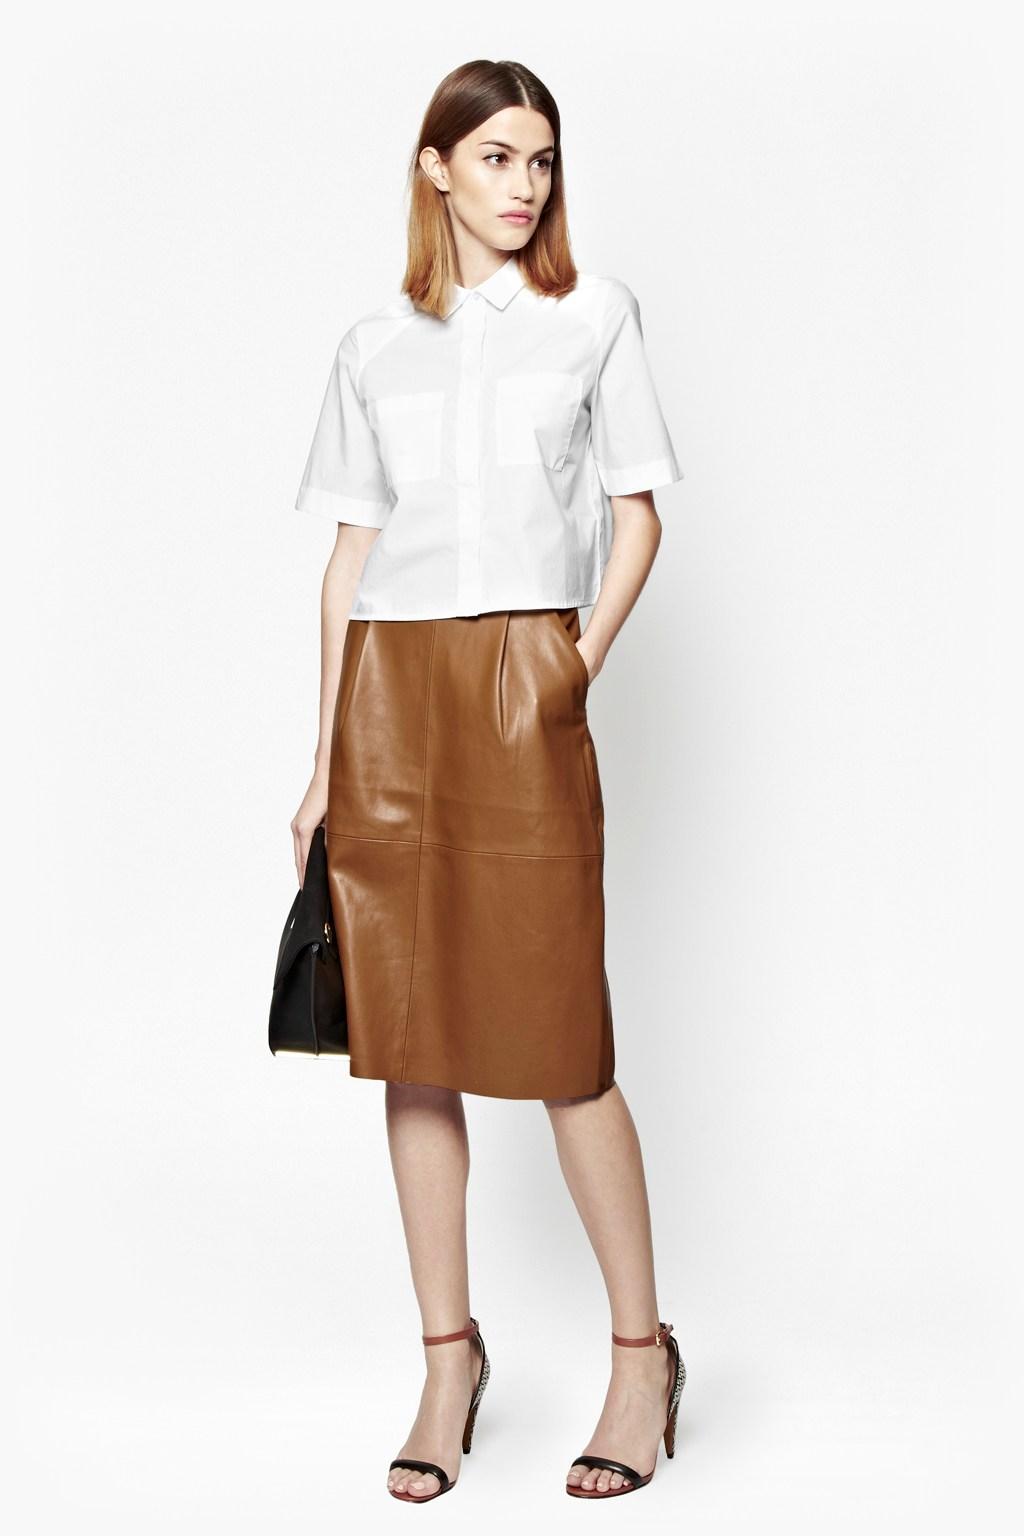 Pastel Pvc Skirt | J Crew Pleated Skirt | Faux Leather Skirt